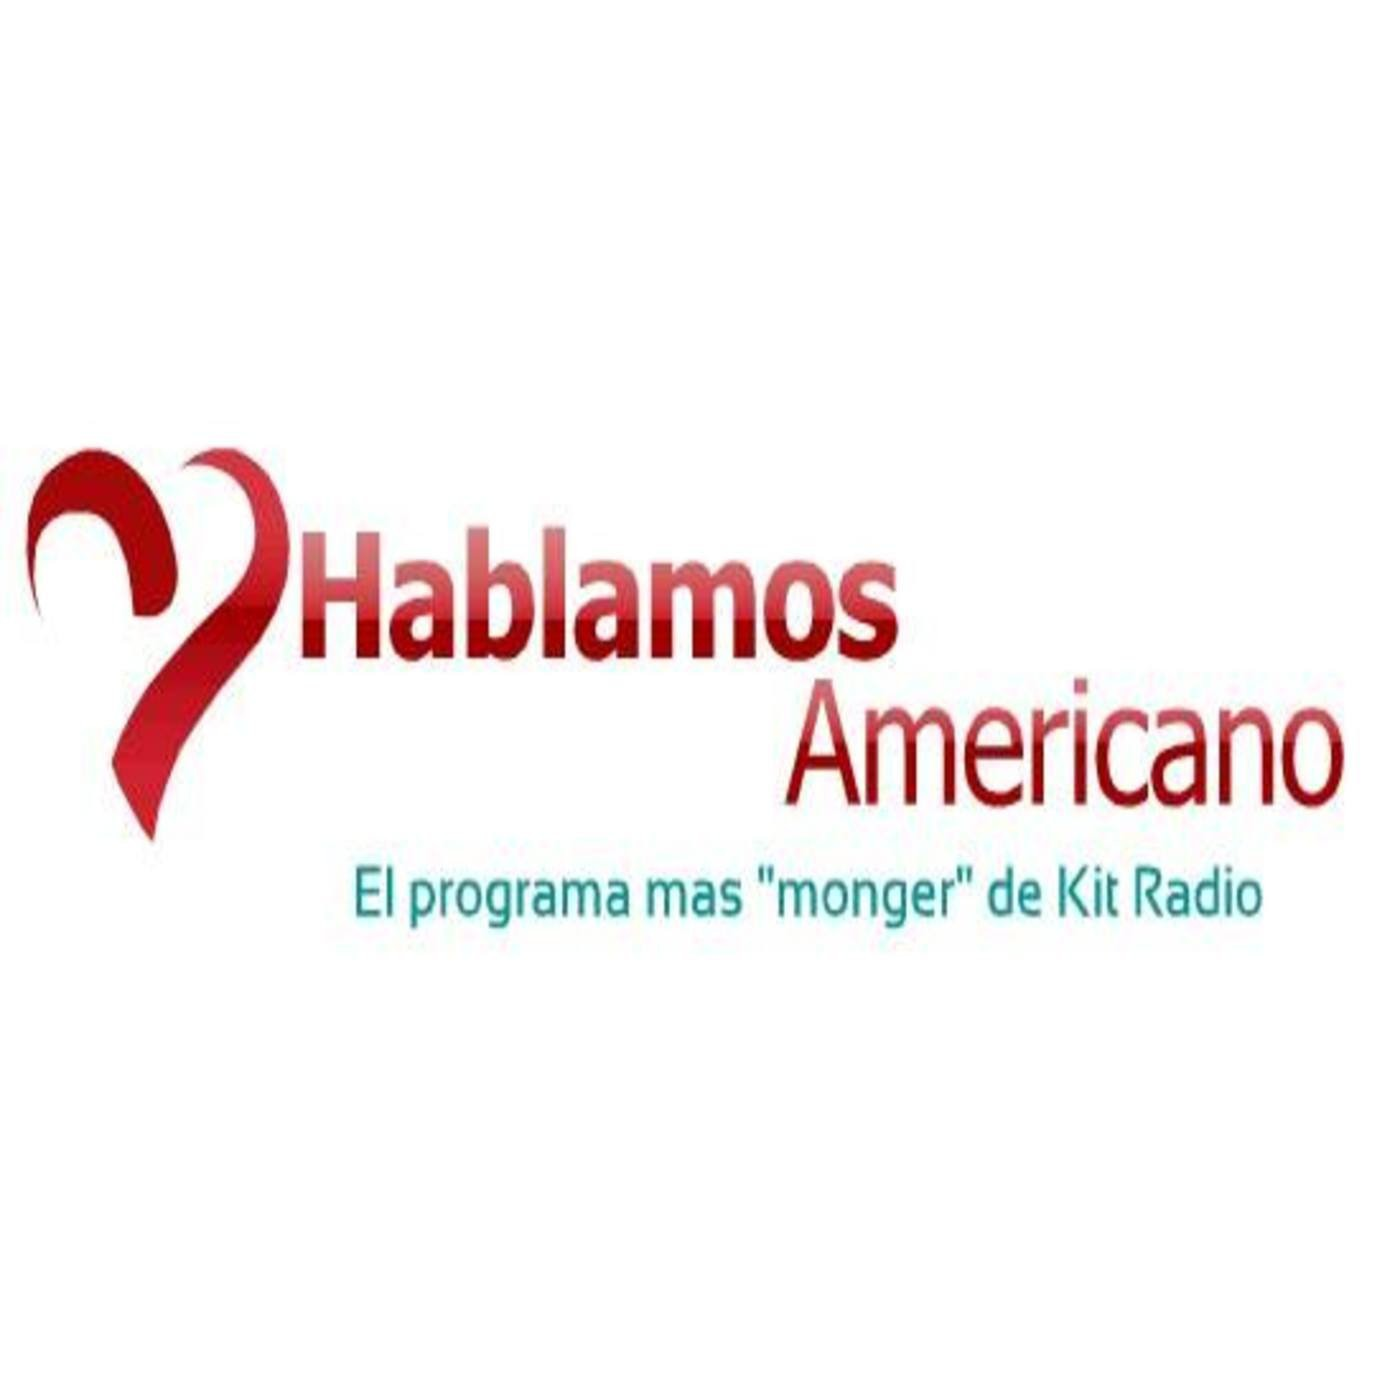 <![CDATA[Podcast ¿Hablamos Americano?]]>